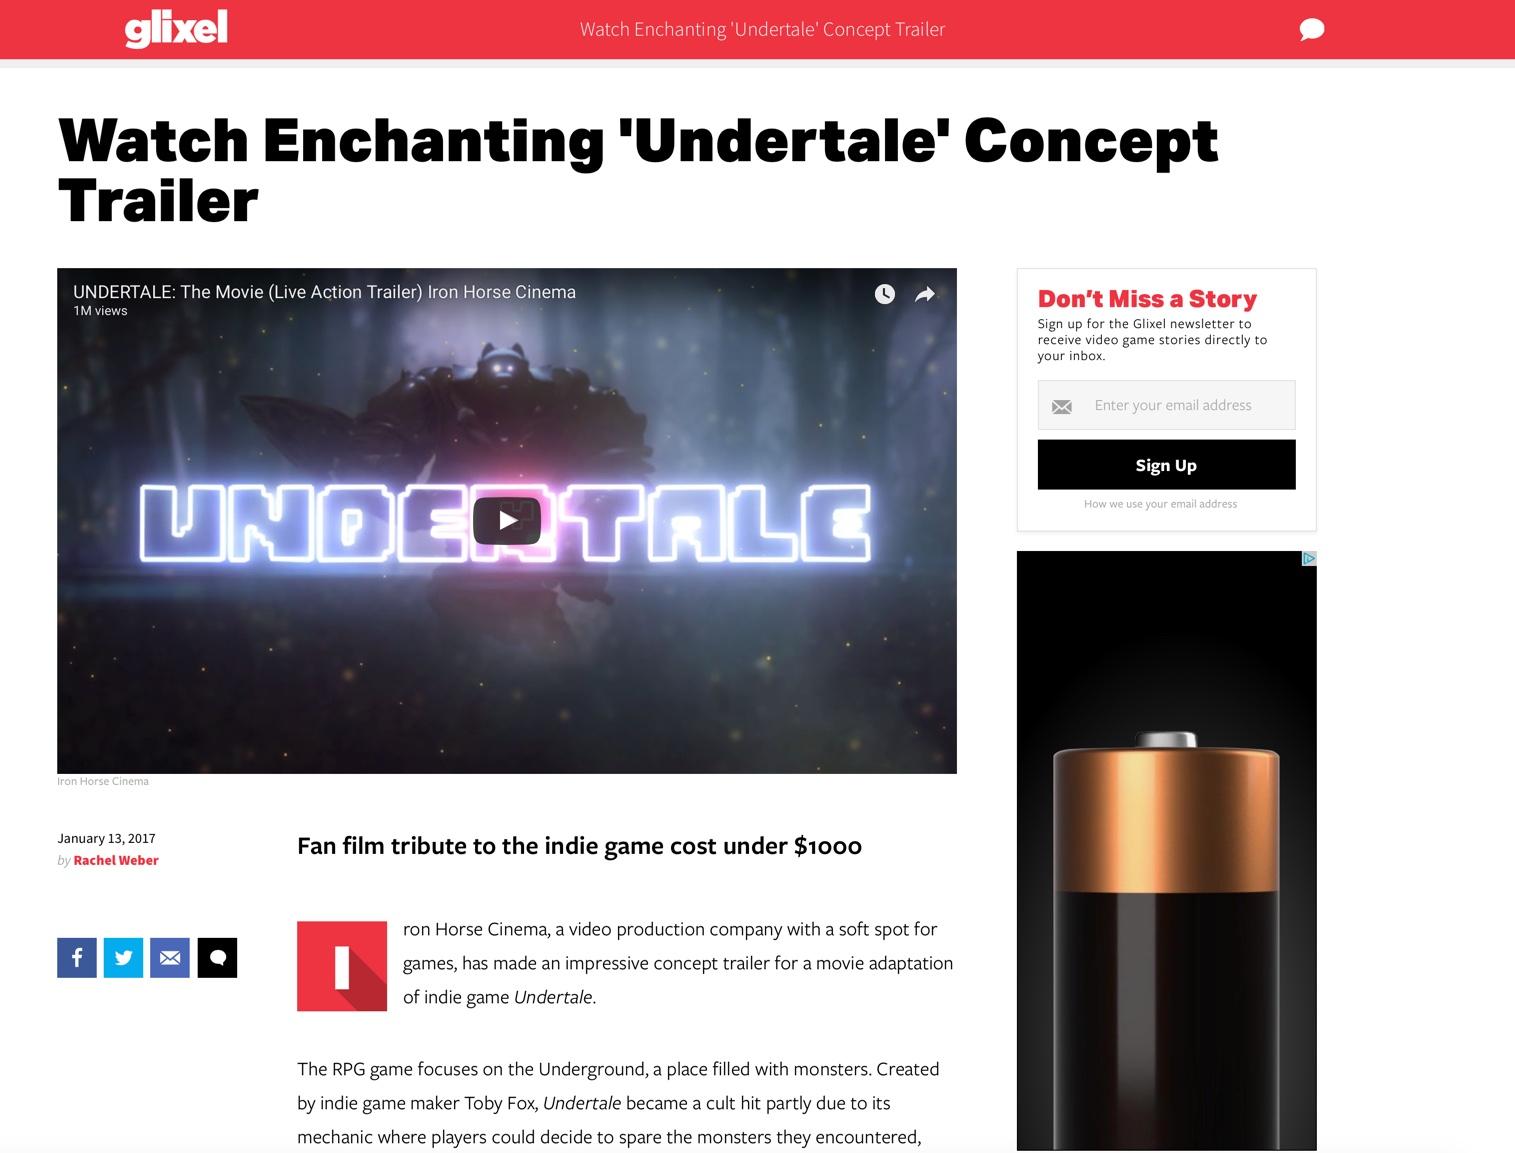 Glixel.com - Undertale trailer interview with Glixel.com (RollingStone.com's gaming section)